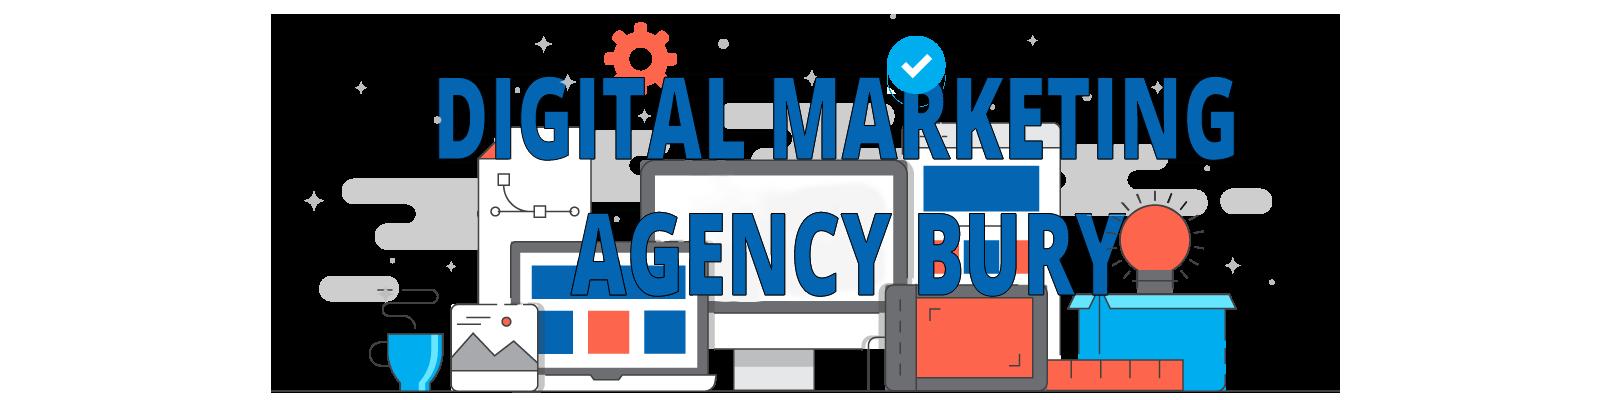 seek social digital marketing agency bury header with transparent background